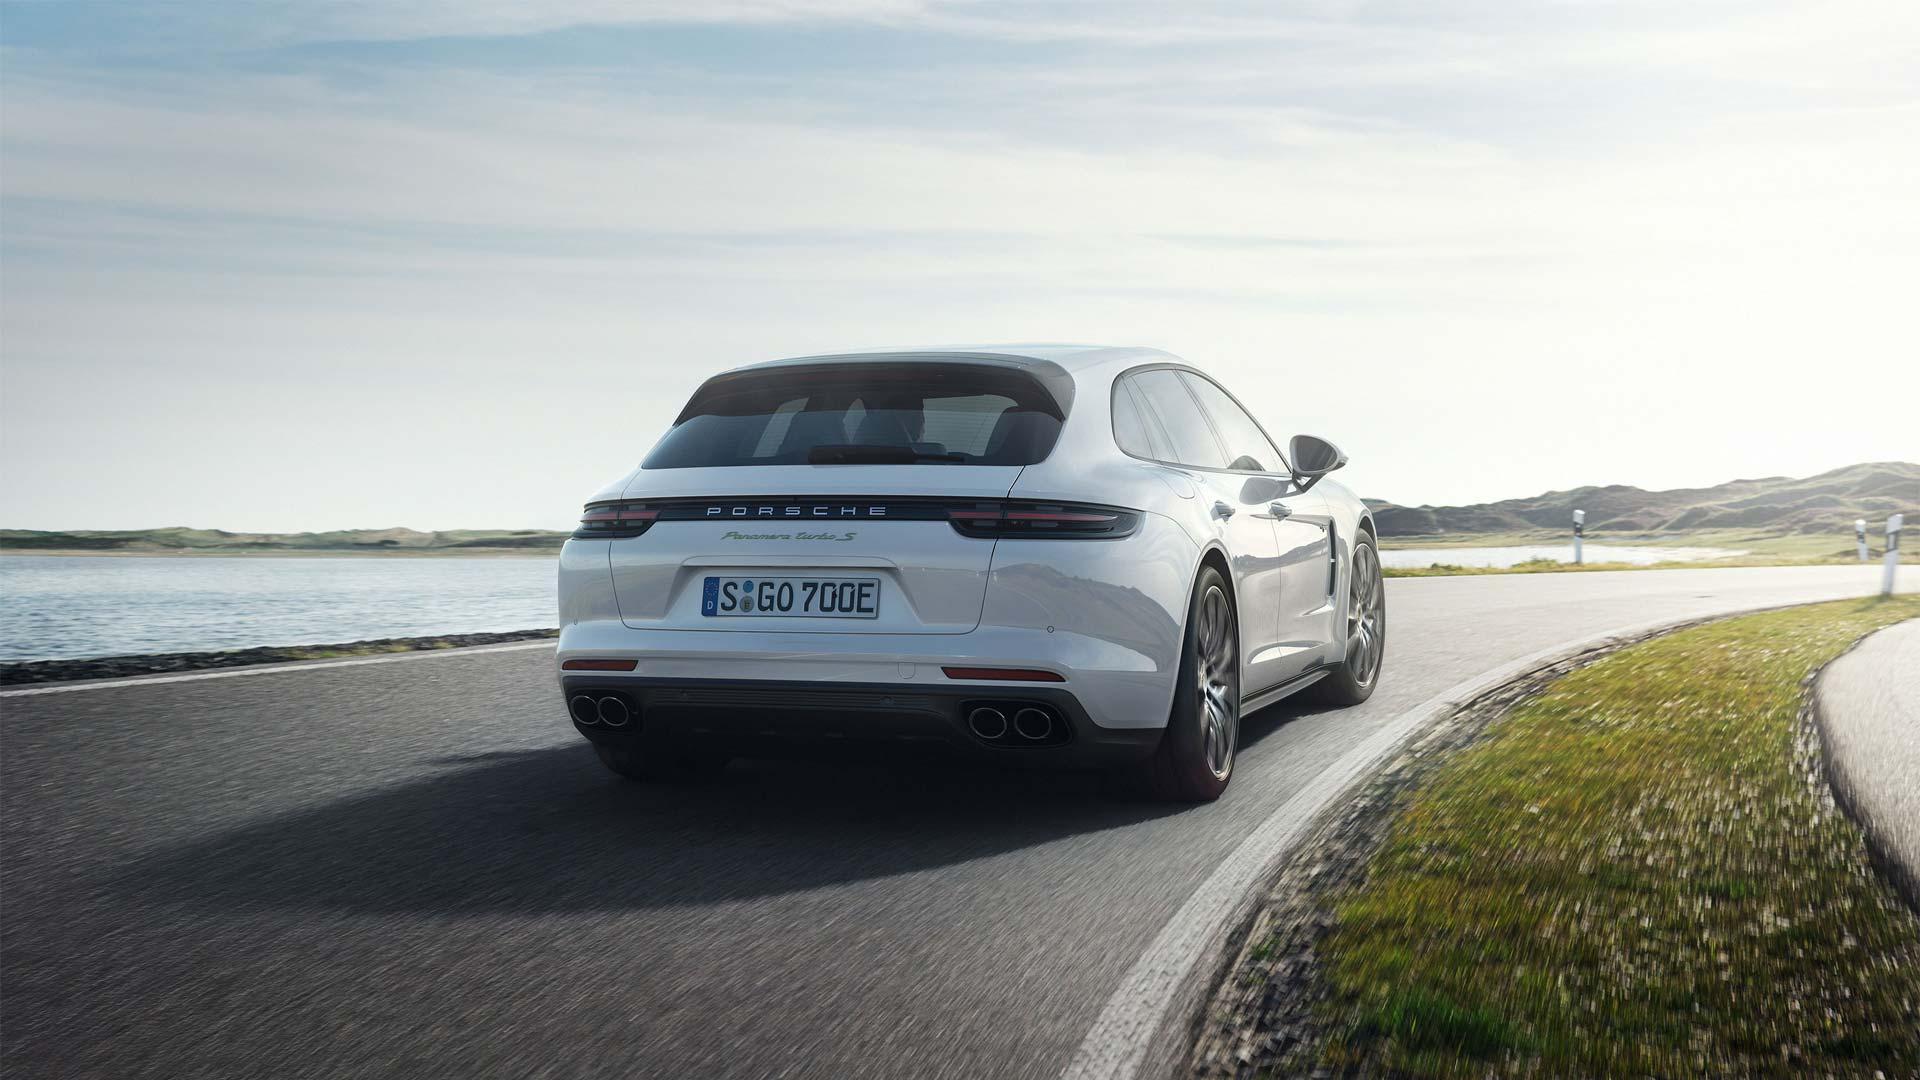 Porsche-Panamera-Turbo-S-E-Hybrid-Sport-Turismo_4